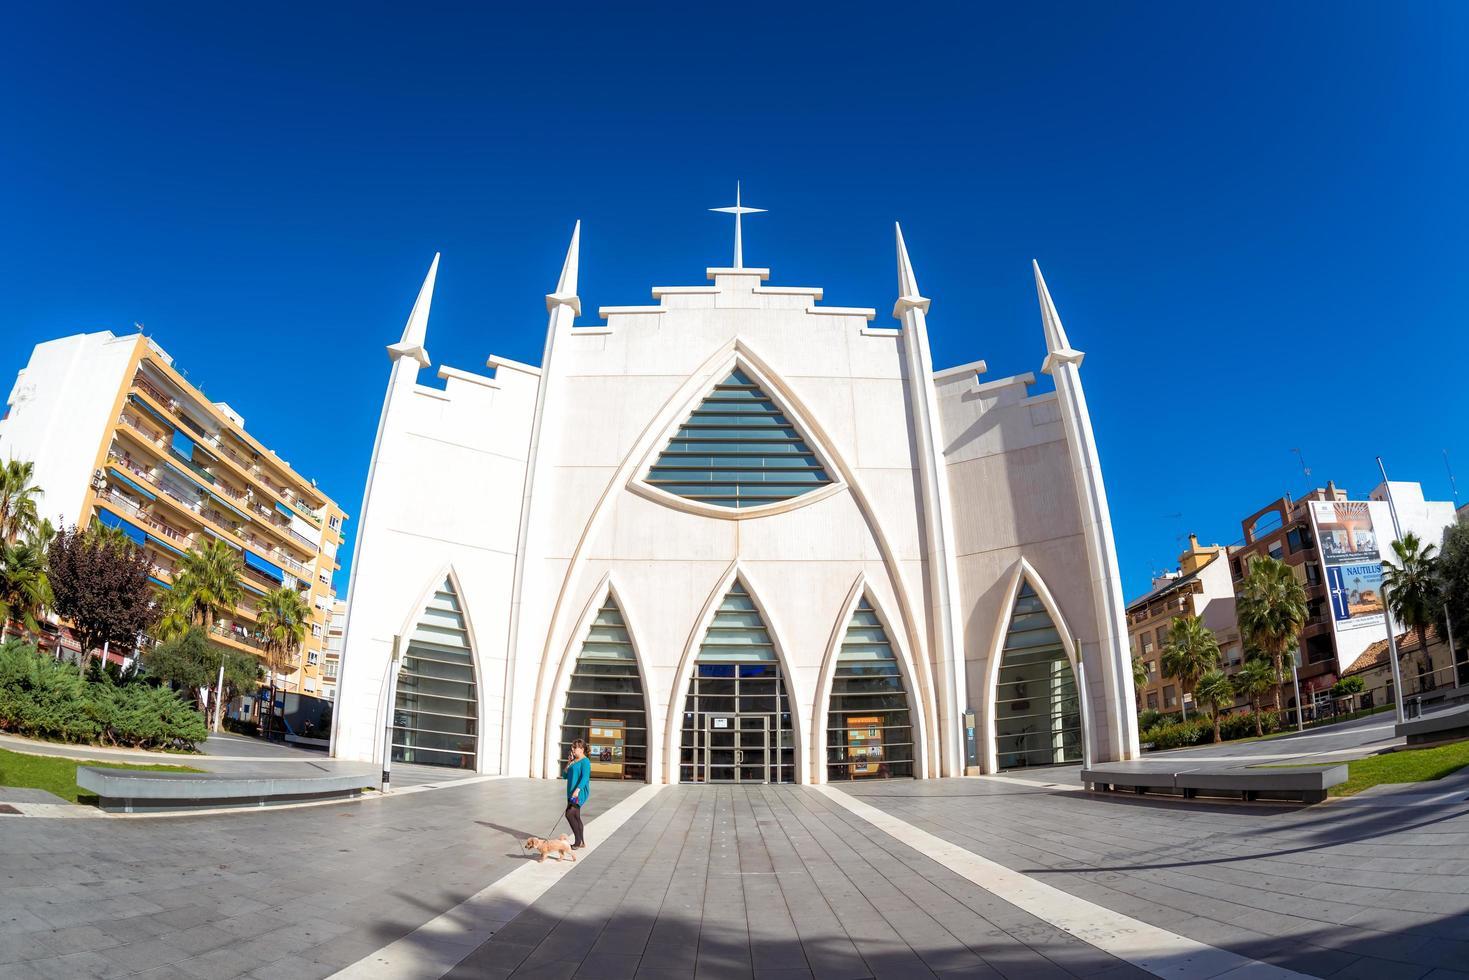 torrevieja, spanien 2017-- iglesia del sagrado corazon de jesus, plaza de oriente foto